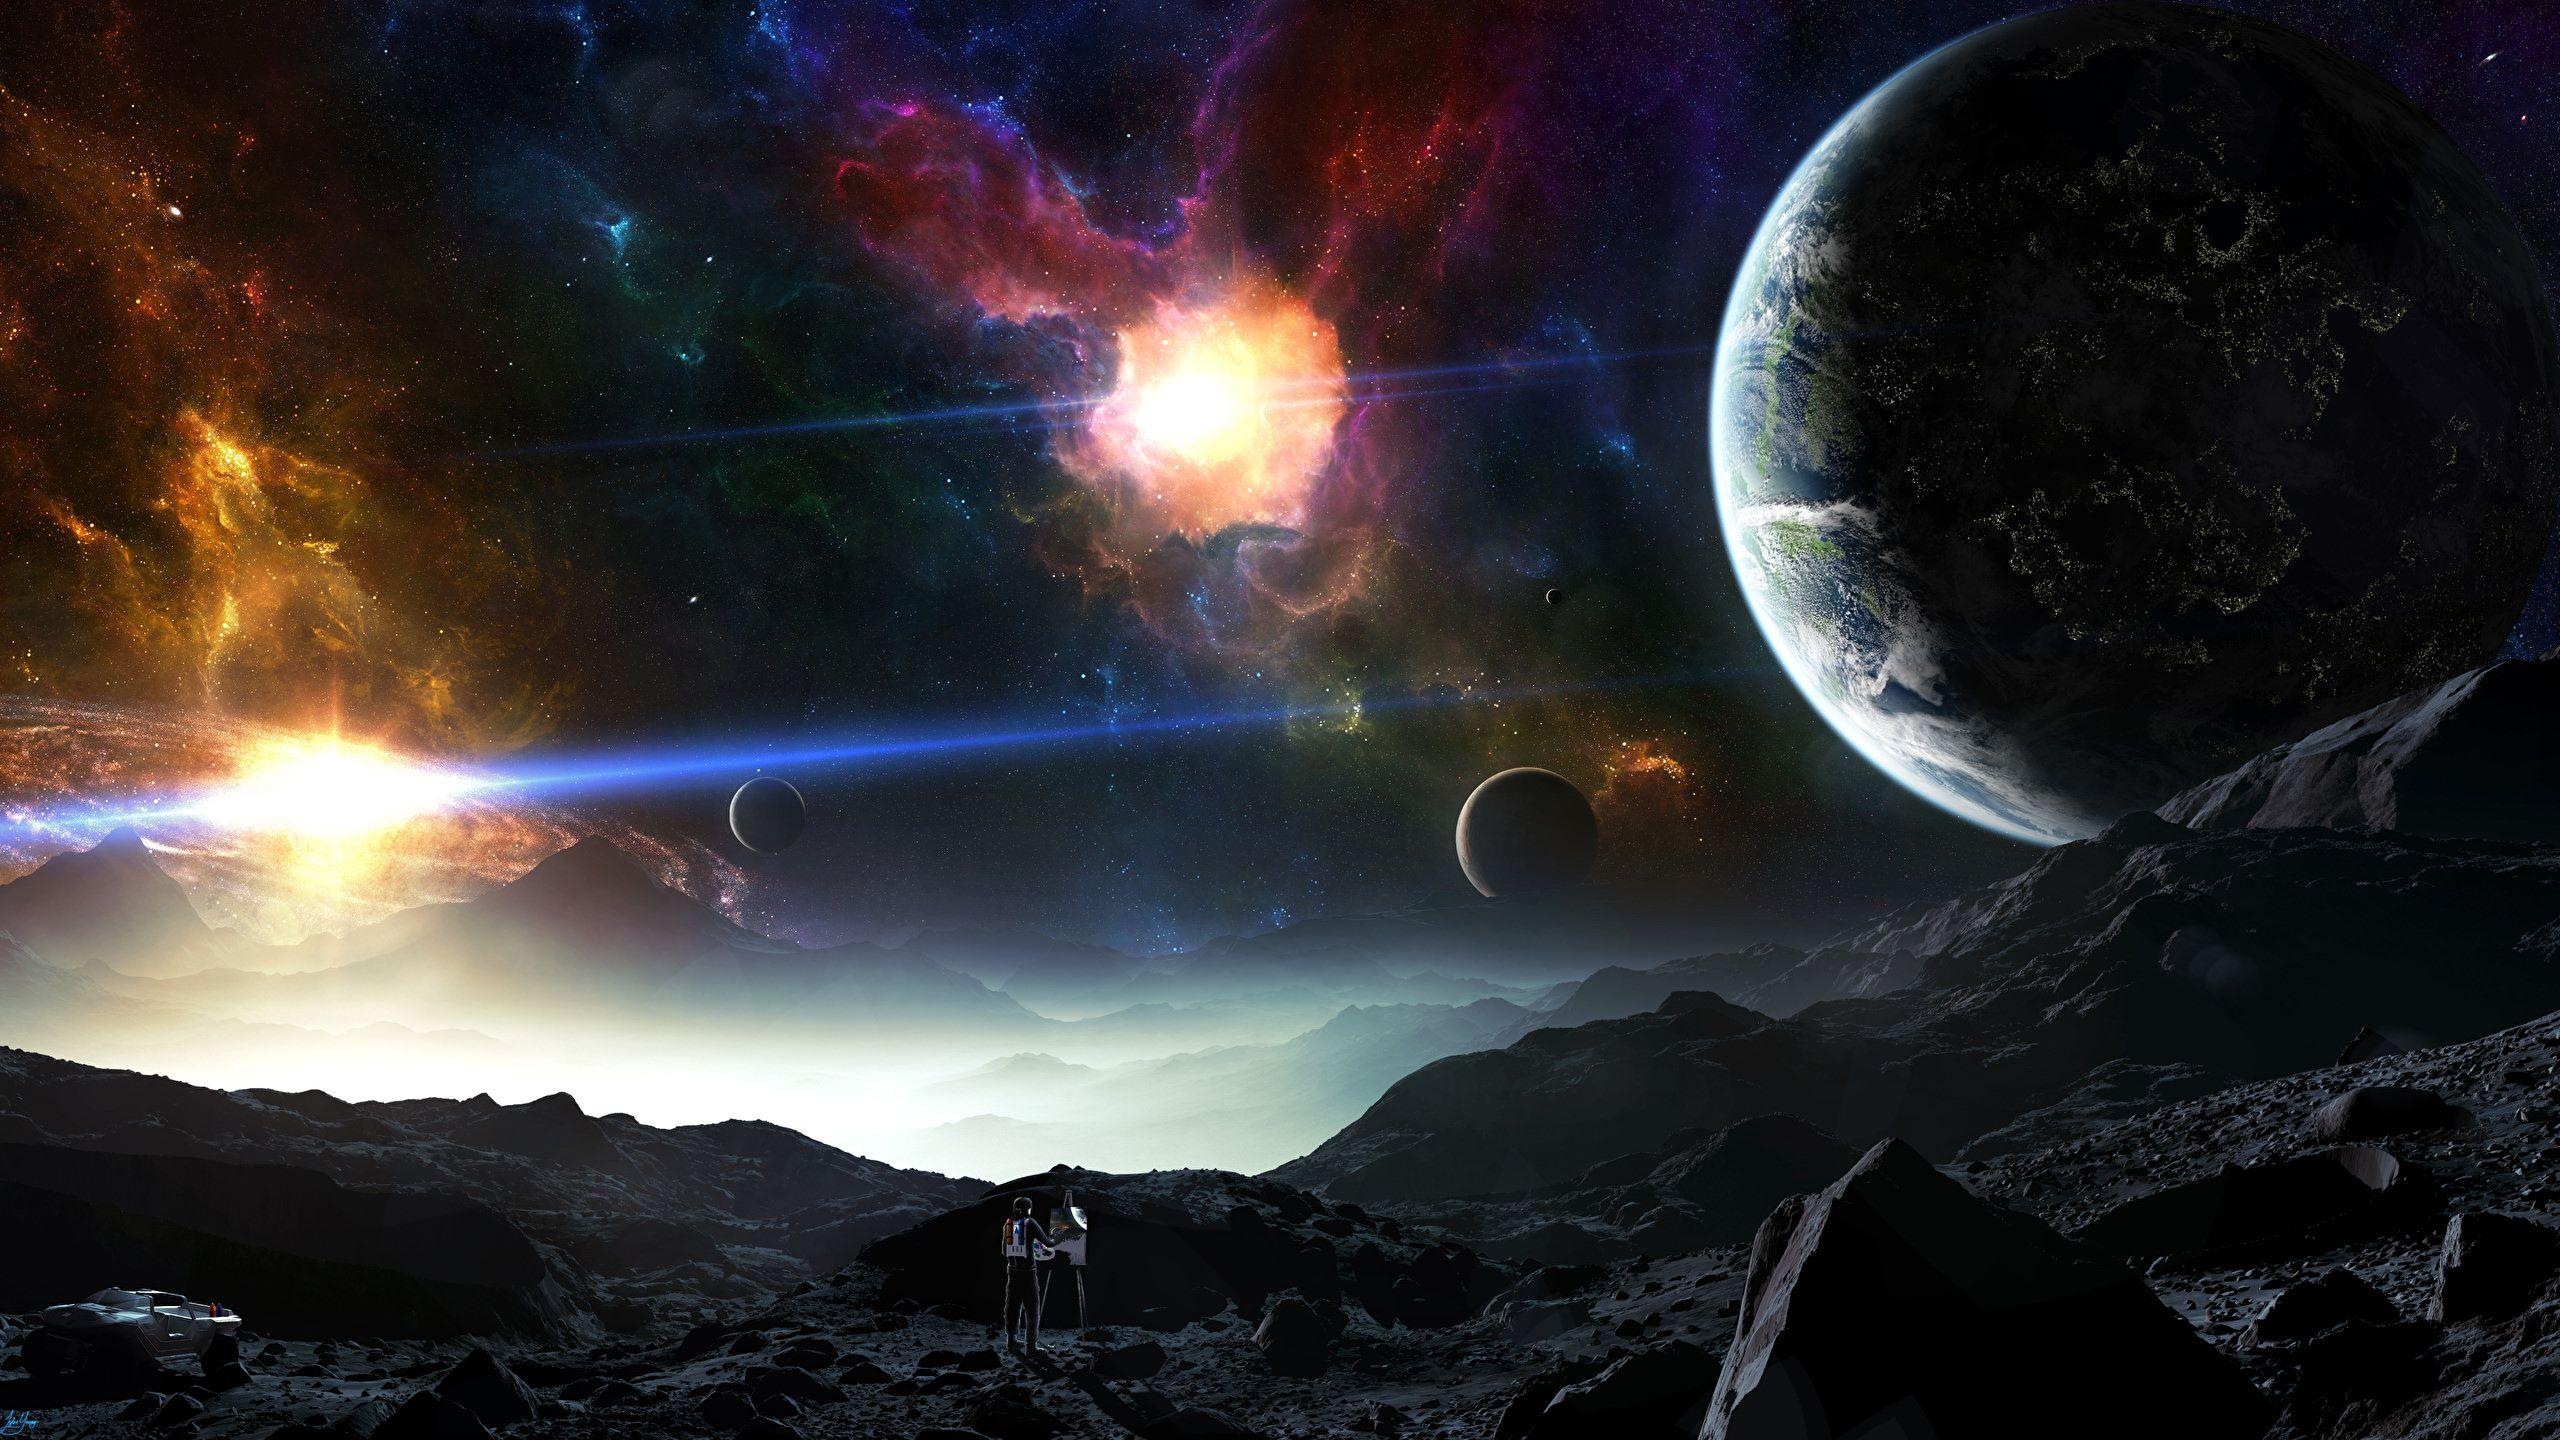 Planet Space 3d2560x1440 Fond Ecran Hd Fond Ecran Et